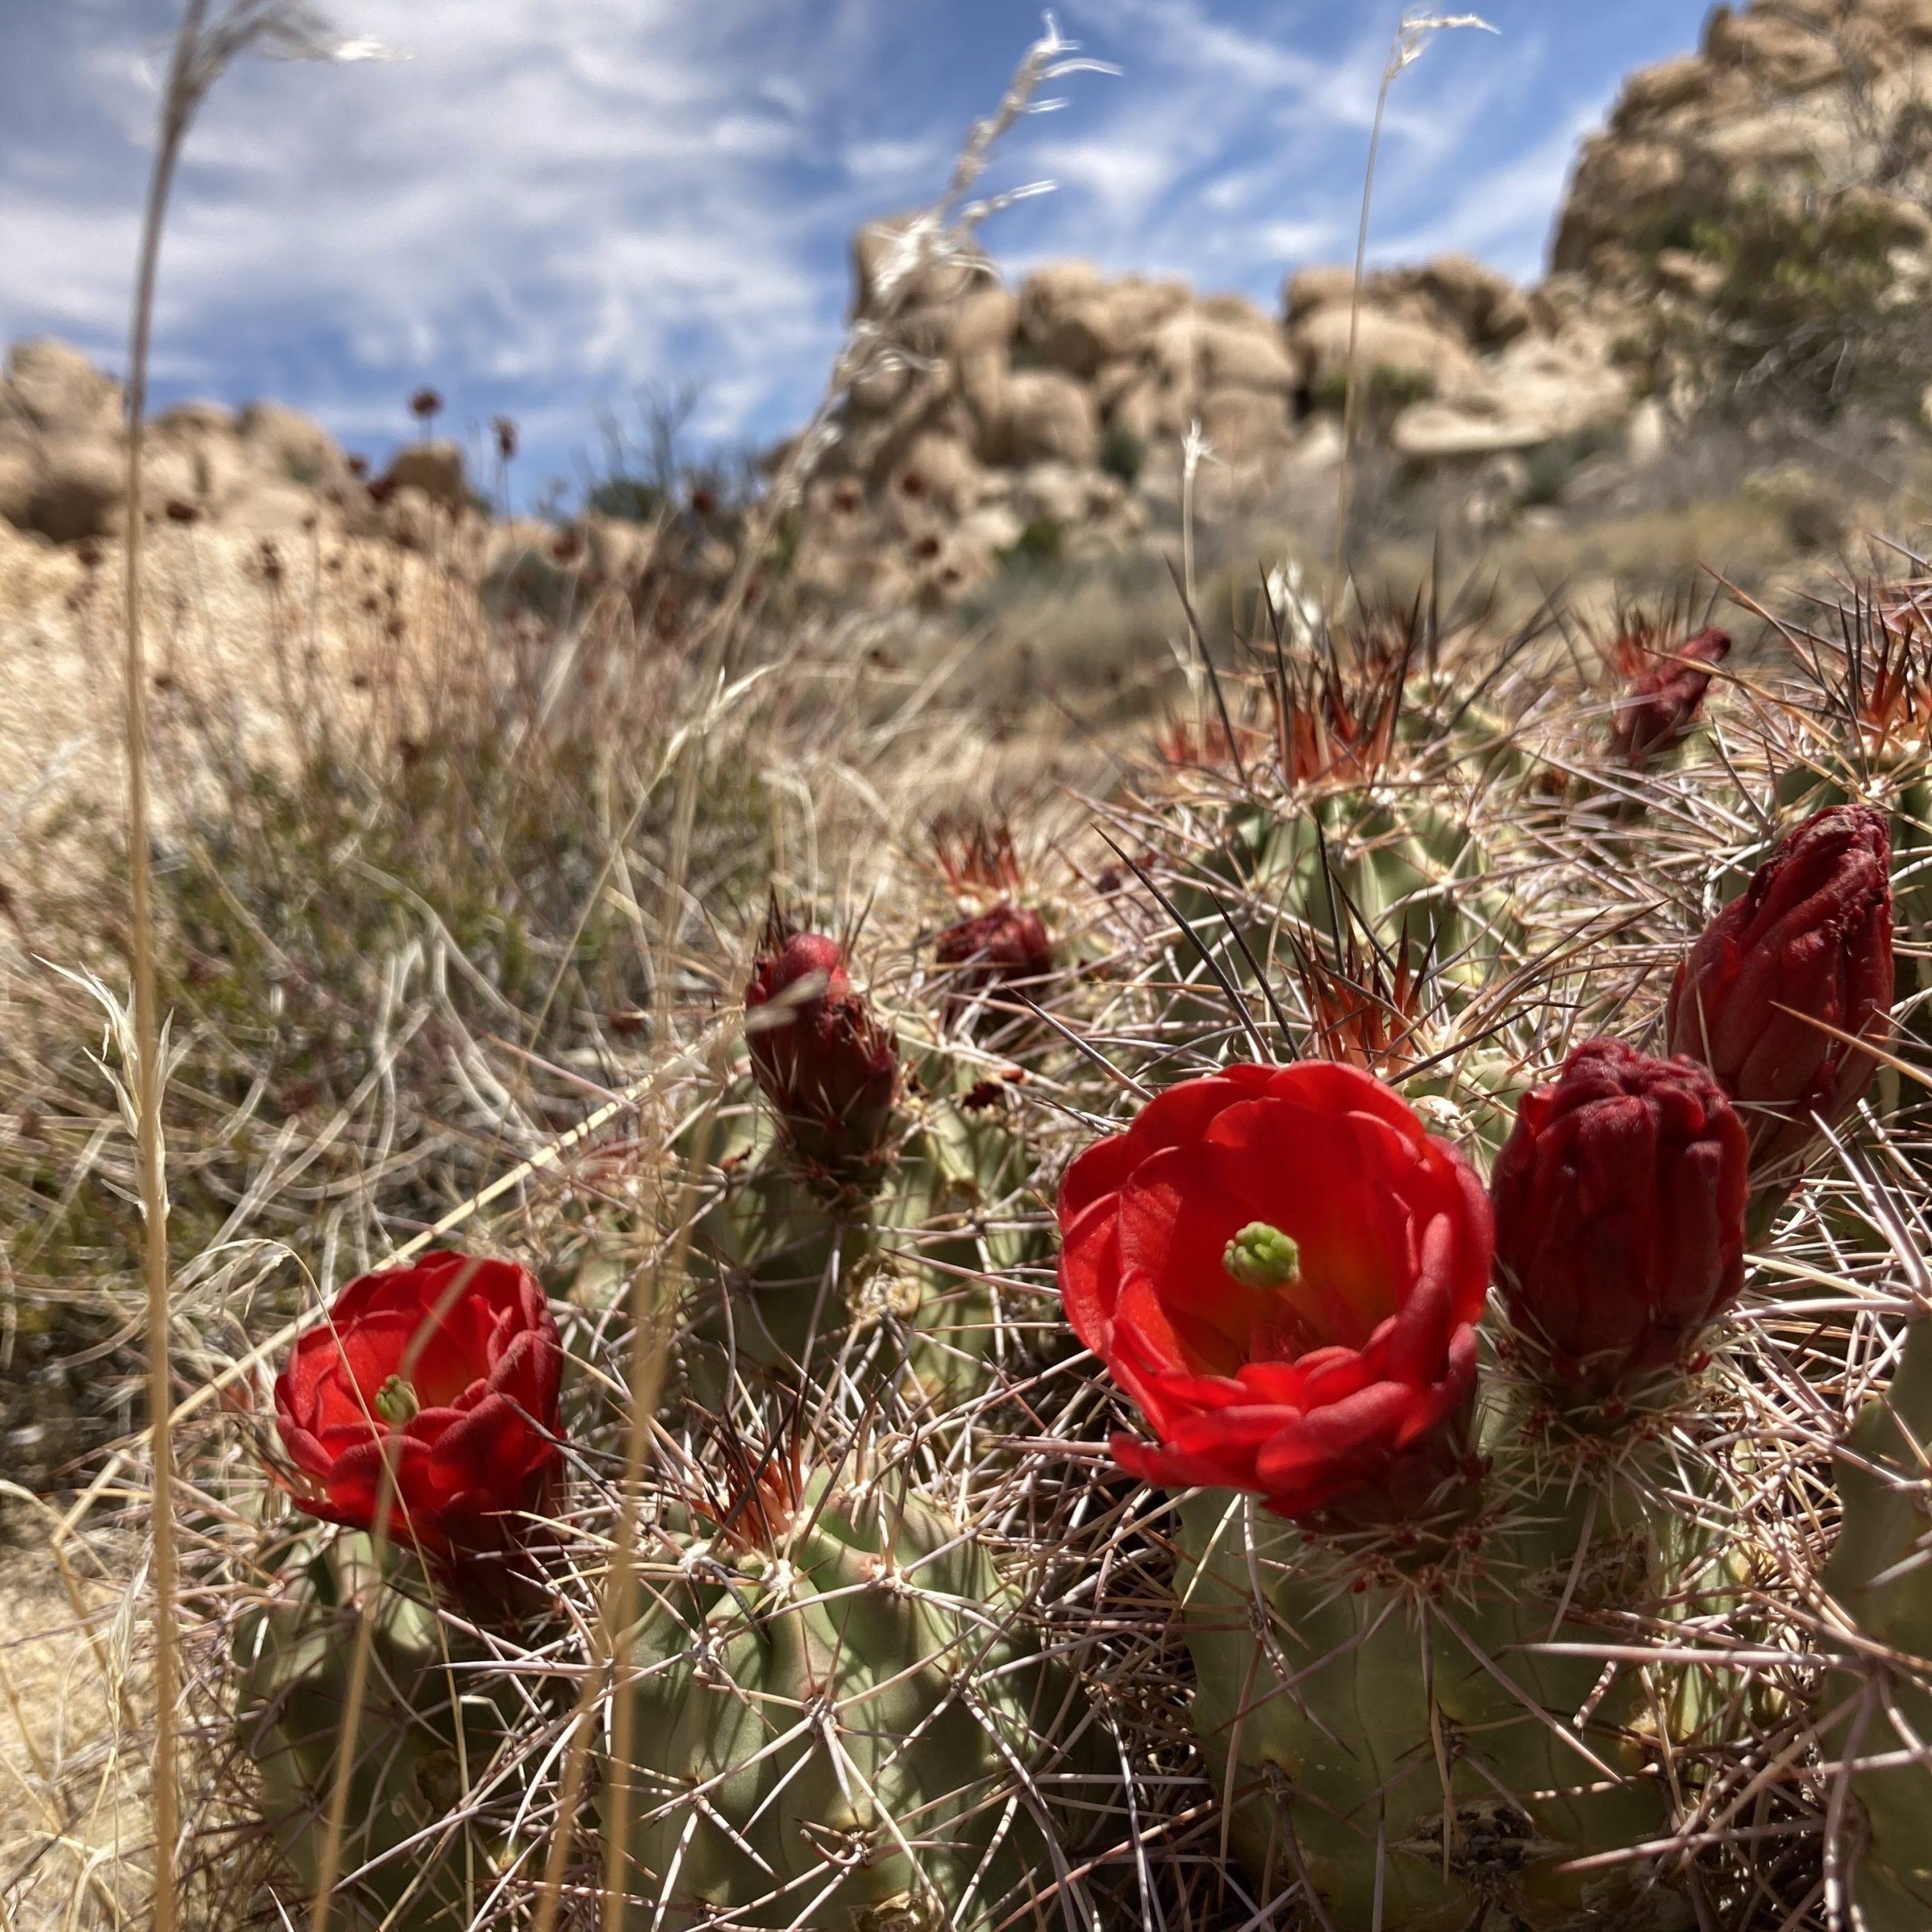 Image of Mojave Kingcup Cactus (Echinocereus triglochidiatus mojavensis) blooming at Joshua Tree National Park.